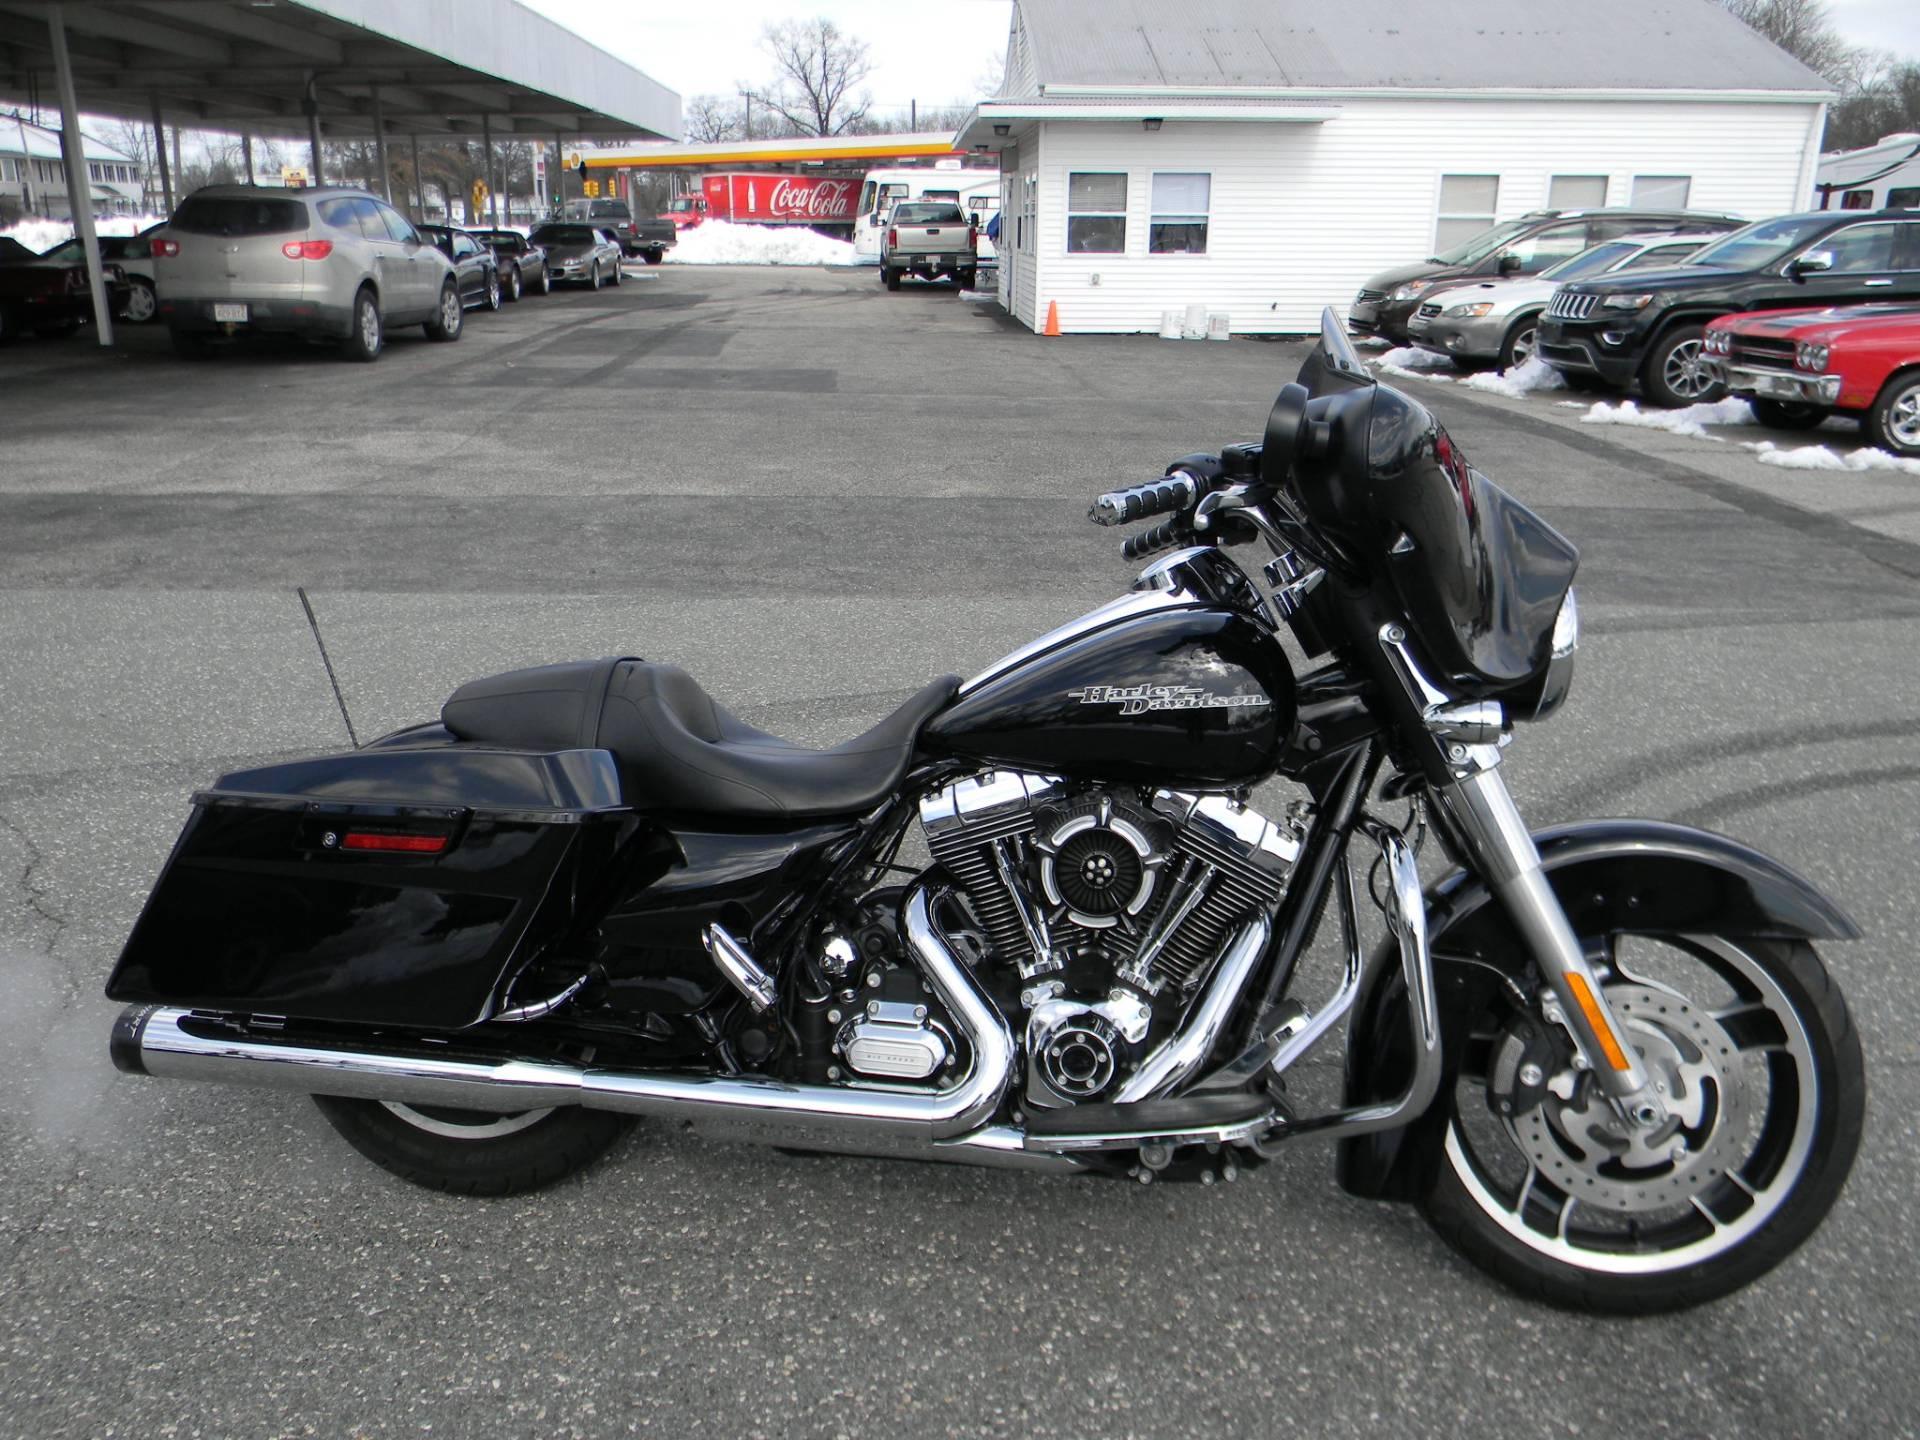 2013 Harley Davidson Street Glide In Springfield Massachusetts